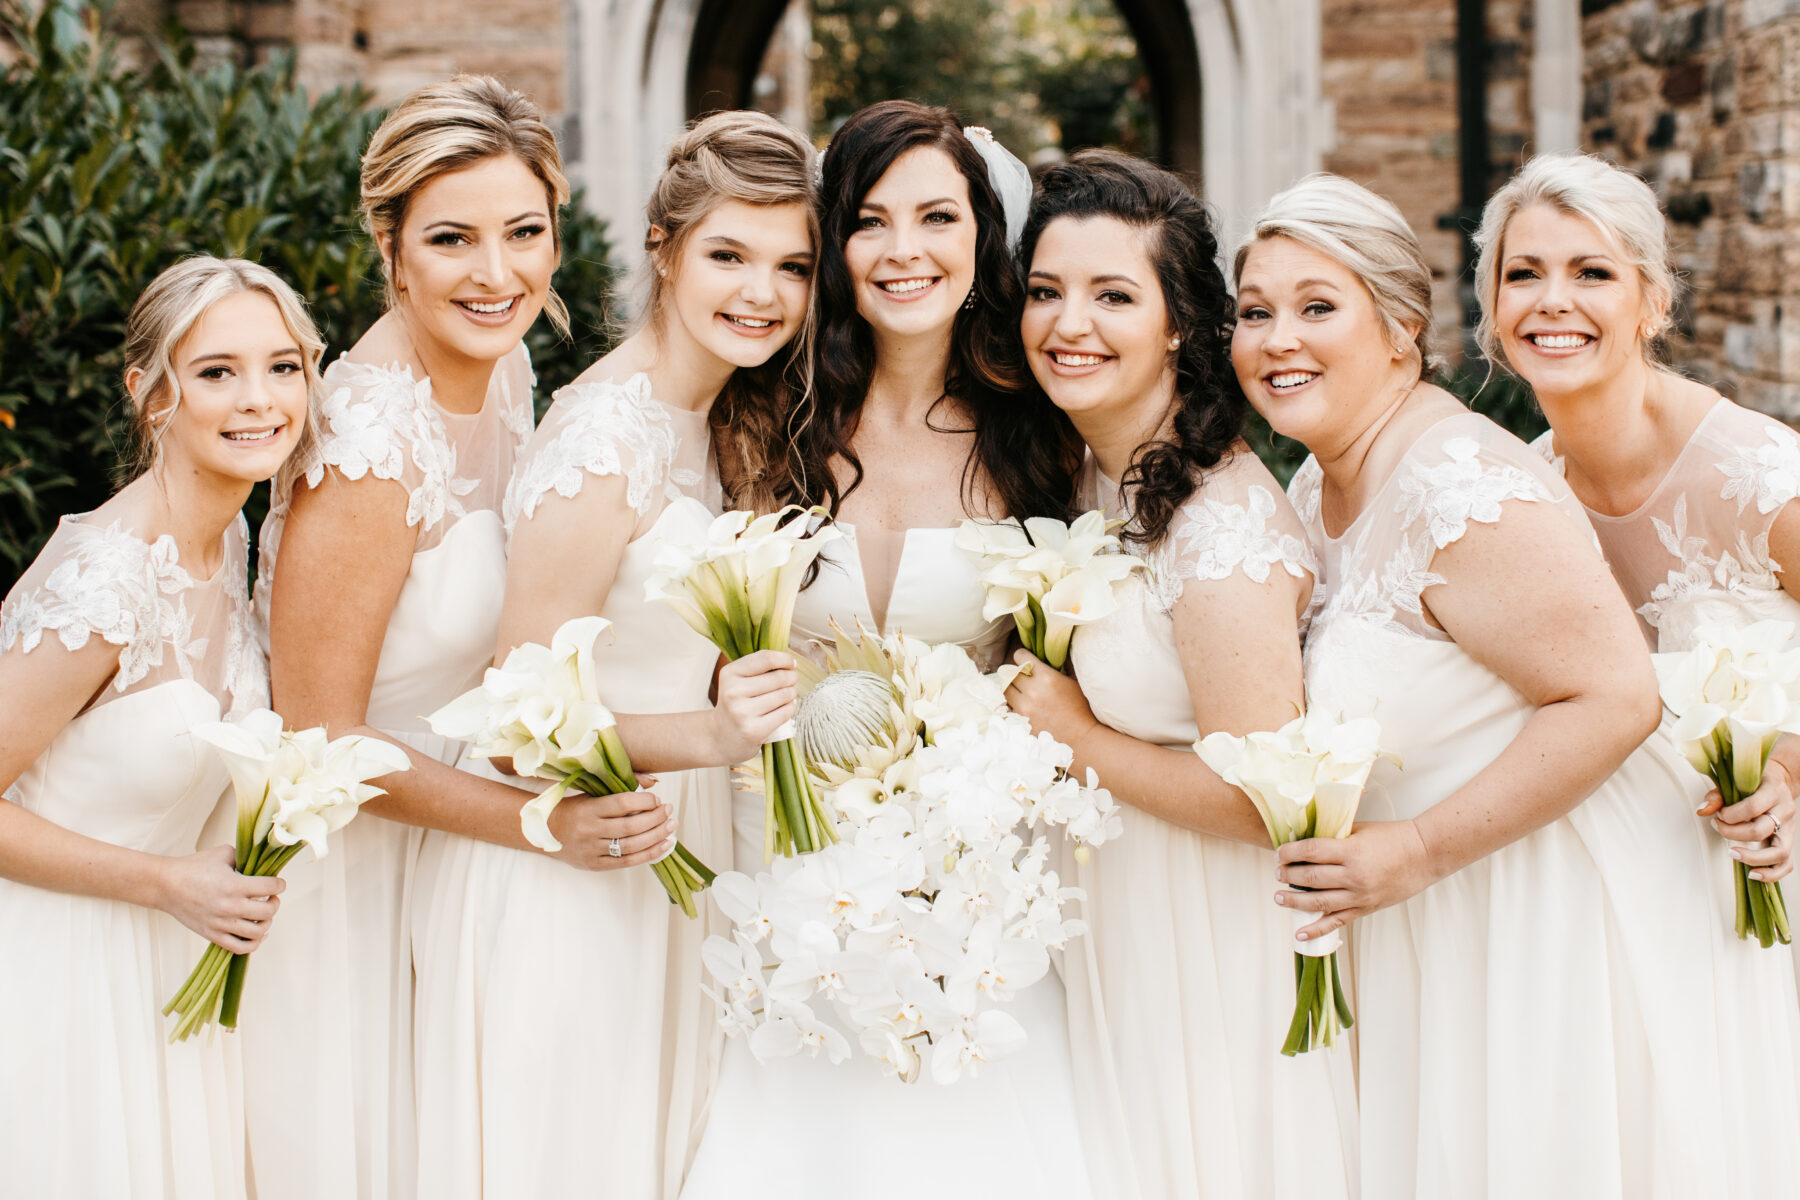 Nashville wedding bouquet by LMA Designs | Nashville Bride Guide